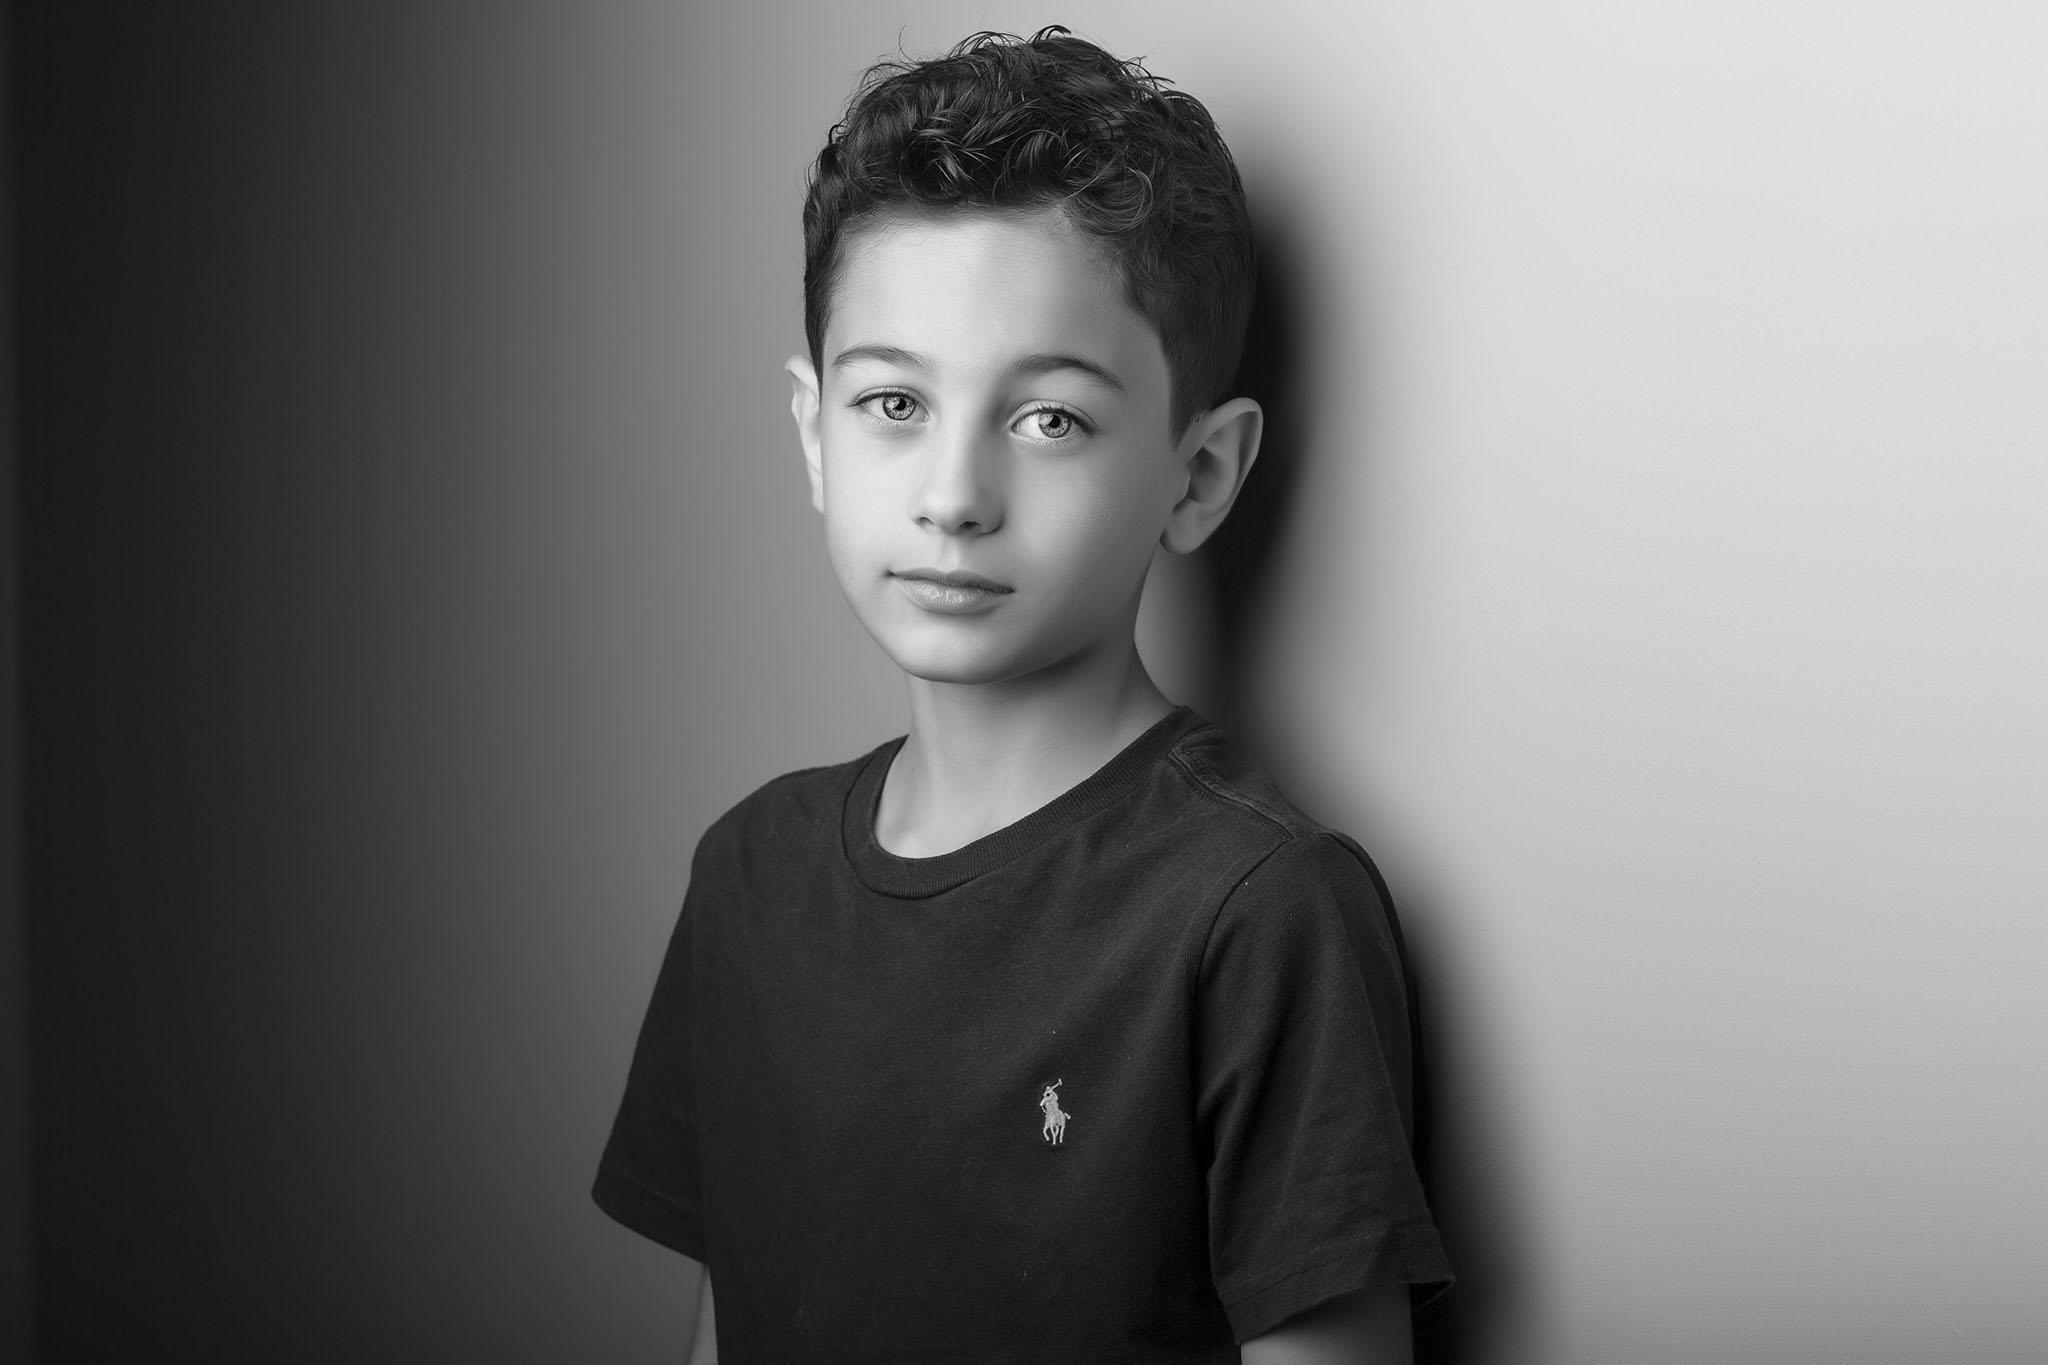 elizabethgphotography_kingslangley_hertfordshire_fineart_childrens_photography_28.jpg